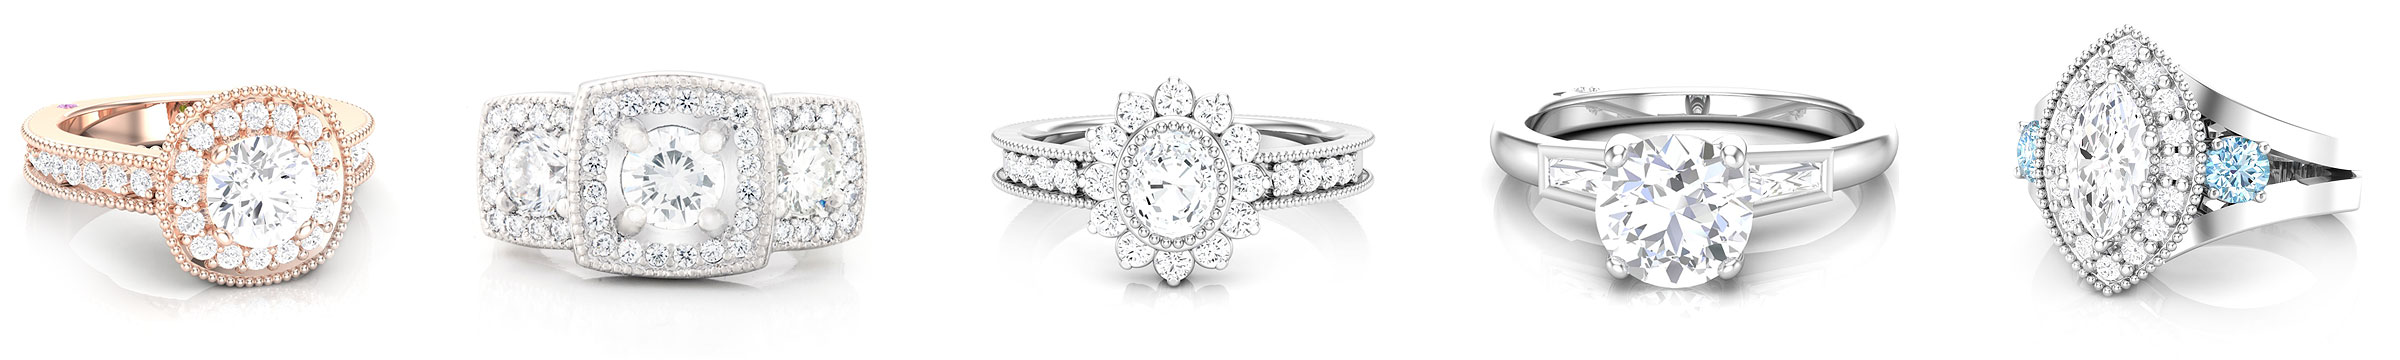 bridal jewelry CAD